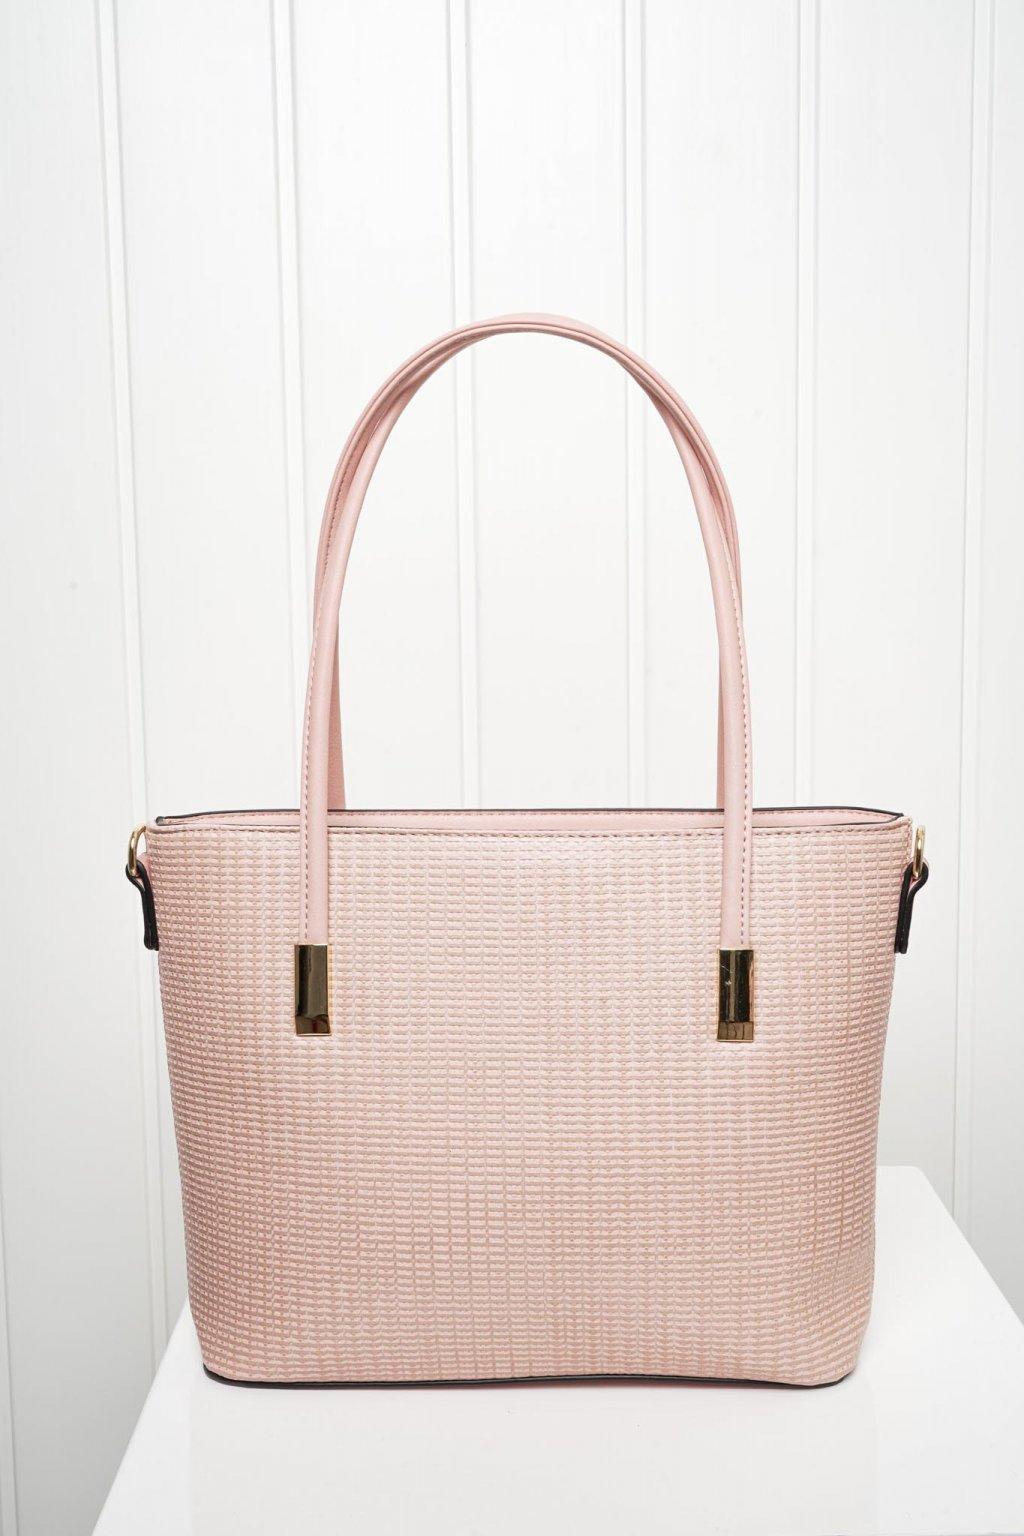 Kabelka, crossbody, ruksak, shopping bag, shopperka, 001